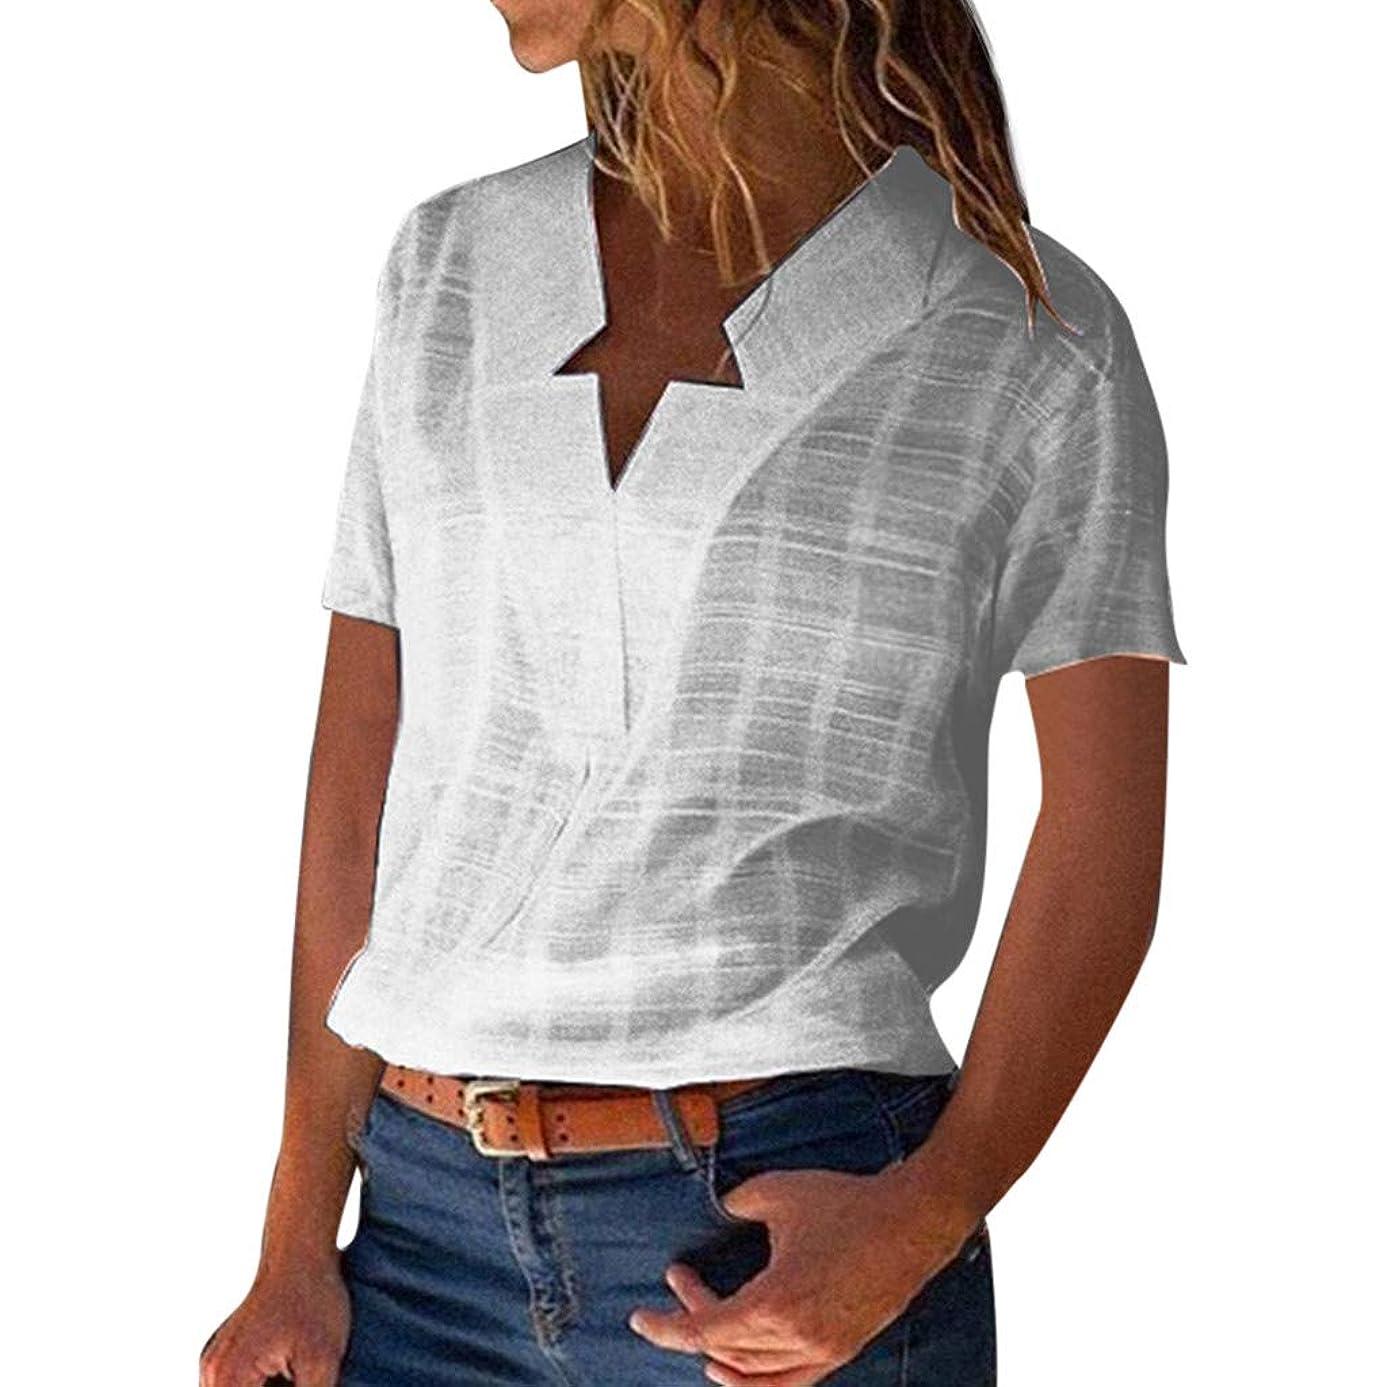 Women V Neck Solid Cotton Linen Short Sleeve Casual T-Shirts Blouse Top Summer Fashion Women 2019 Under $10